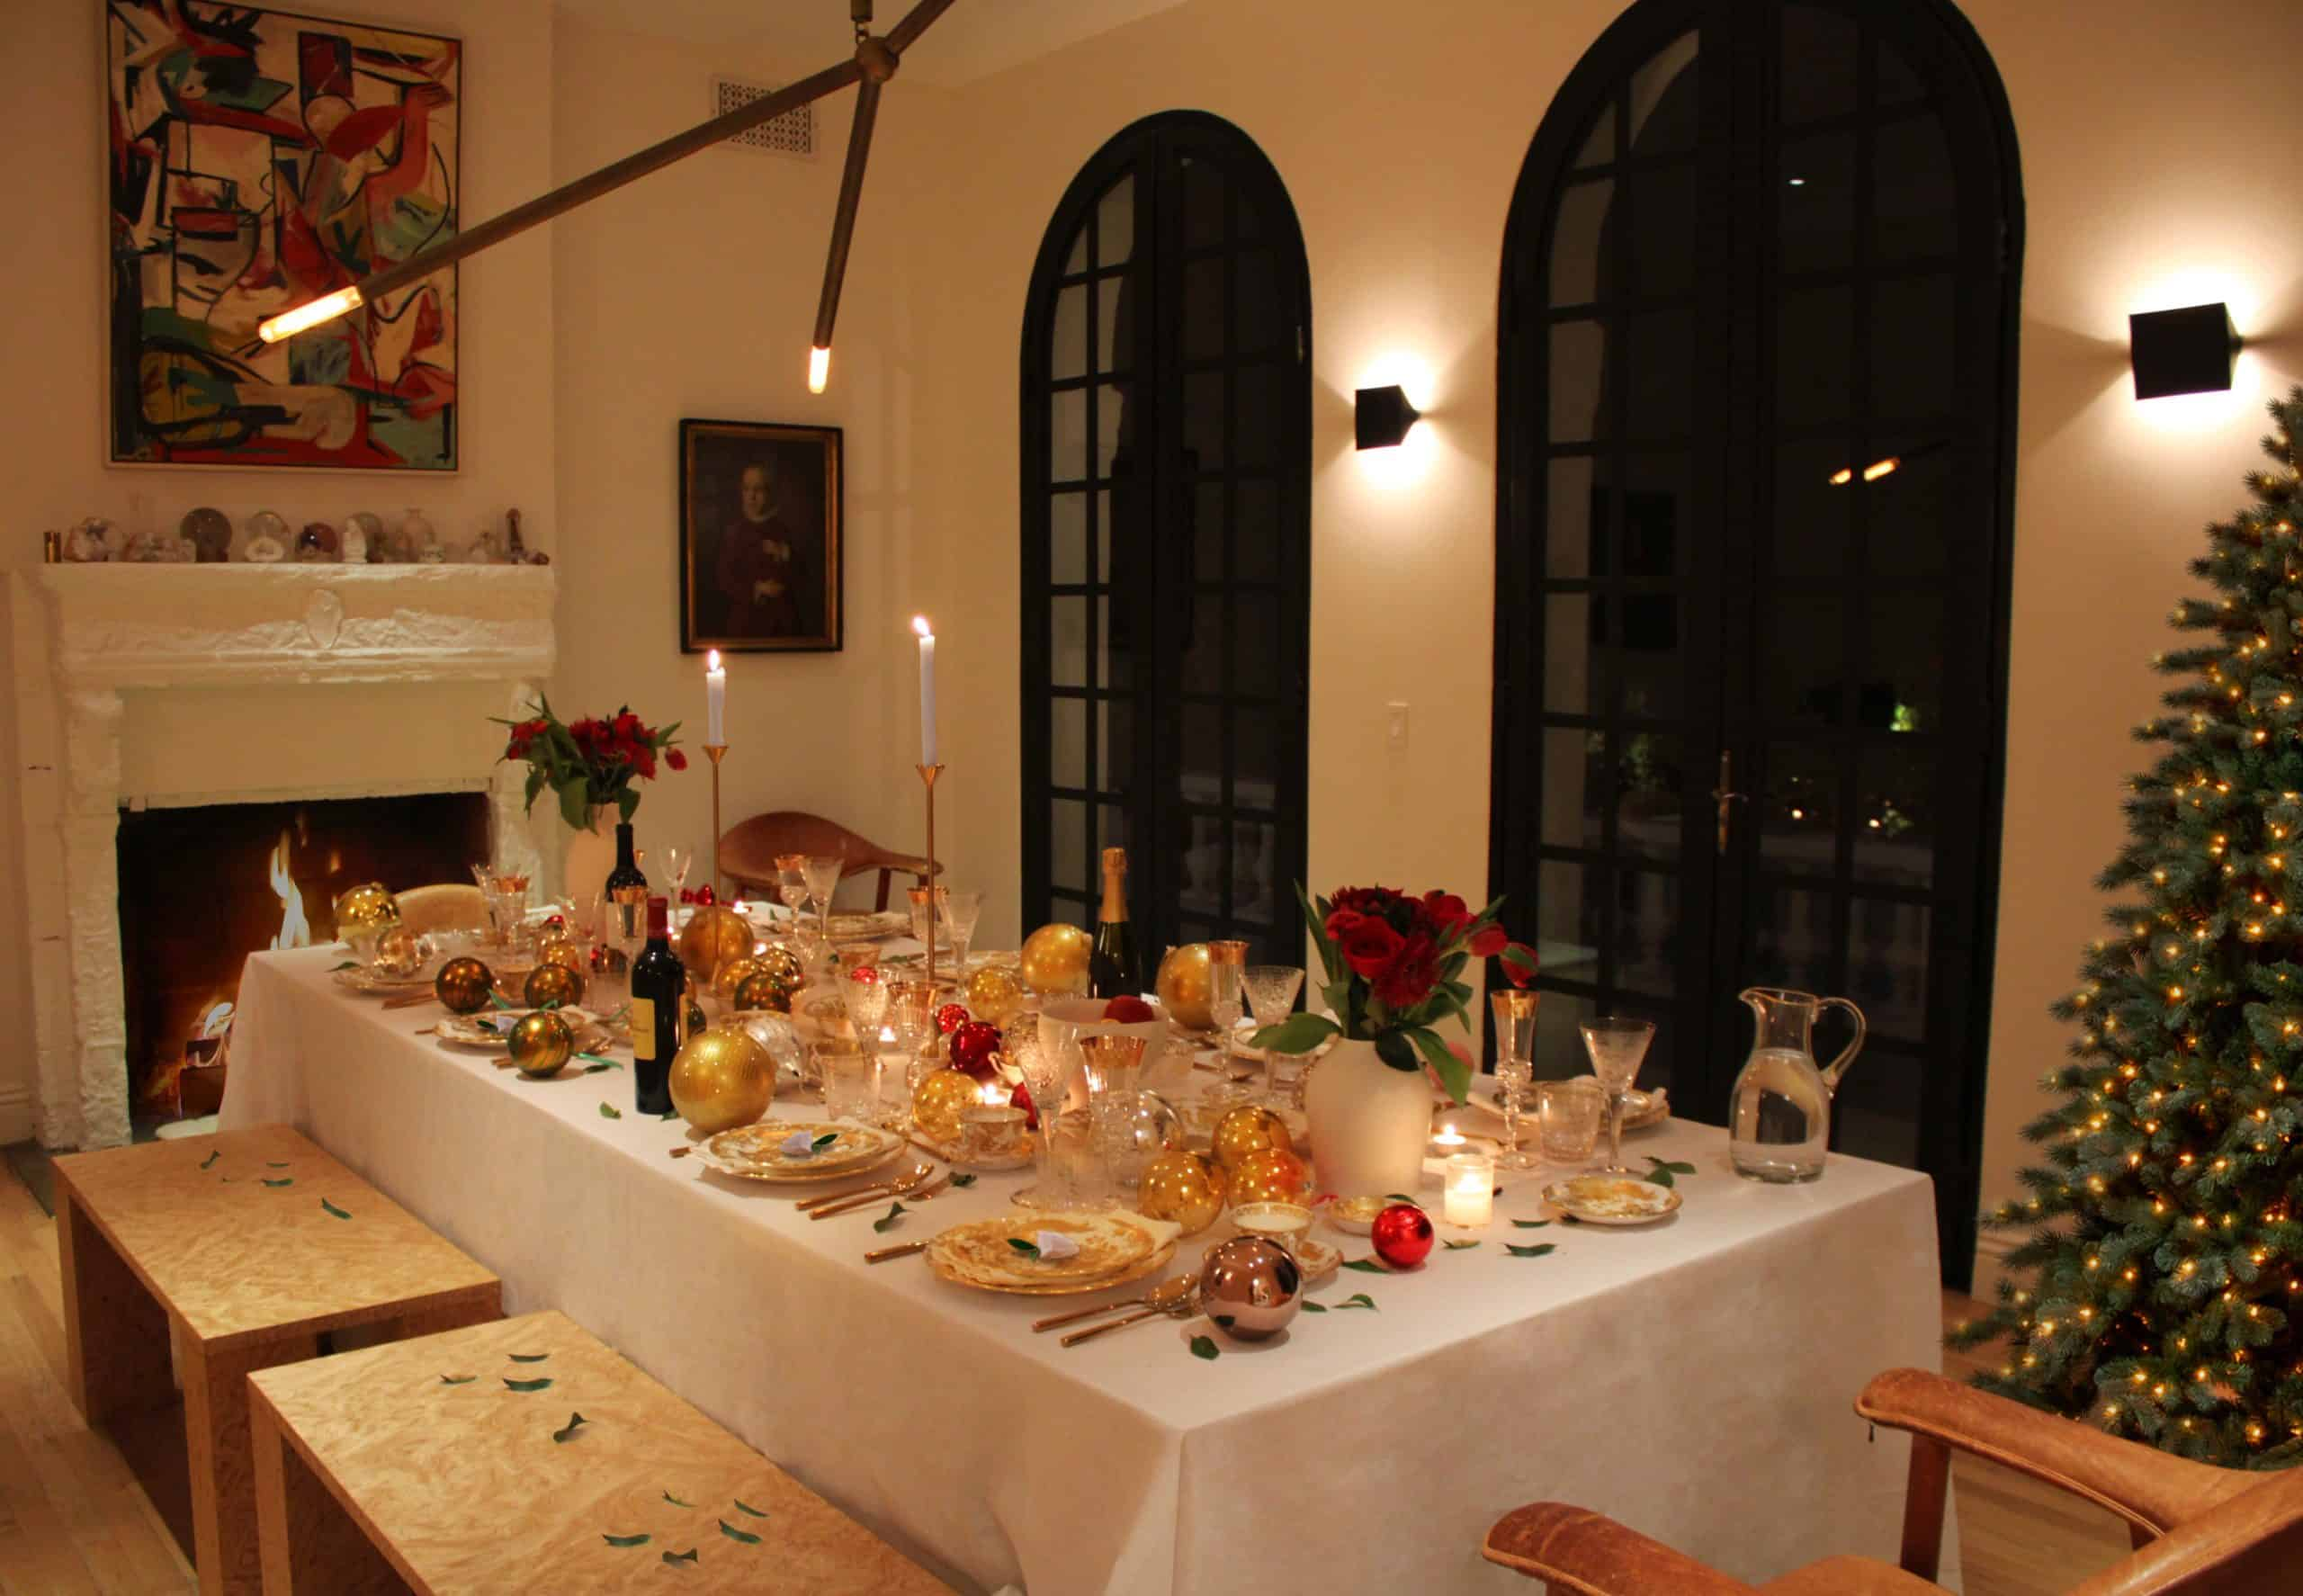 Brigette Romanek's holiday tablescape